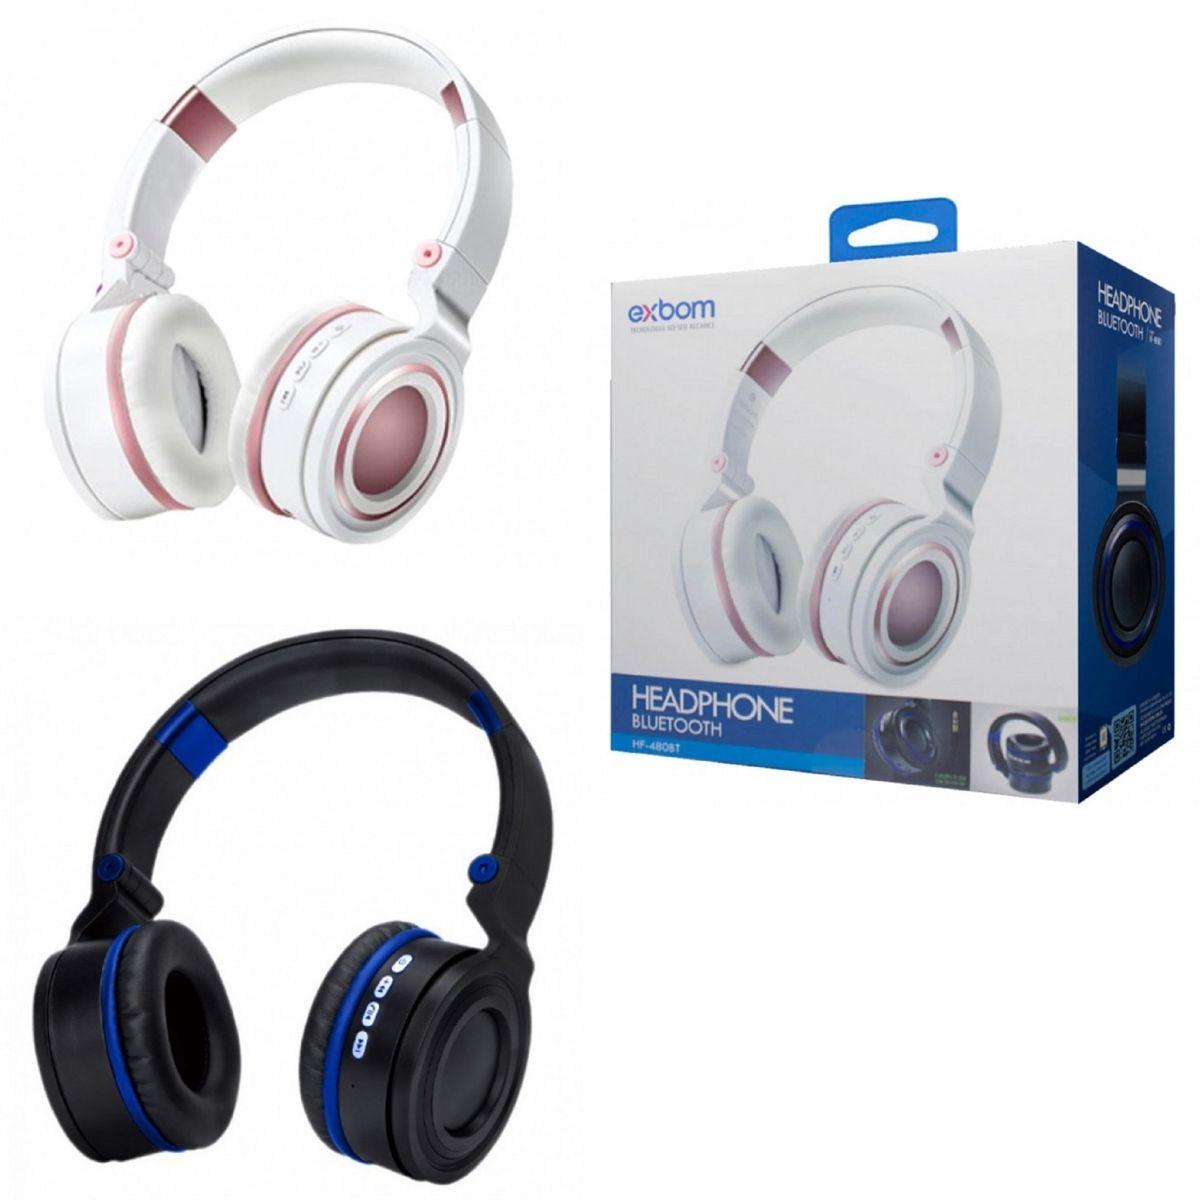 Headphone Dobrável  Com Microfone Wireless Bluetooth Exbom